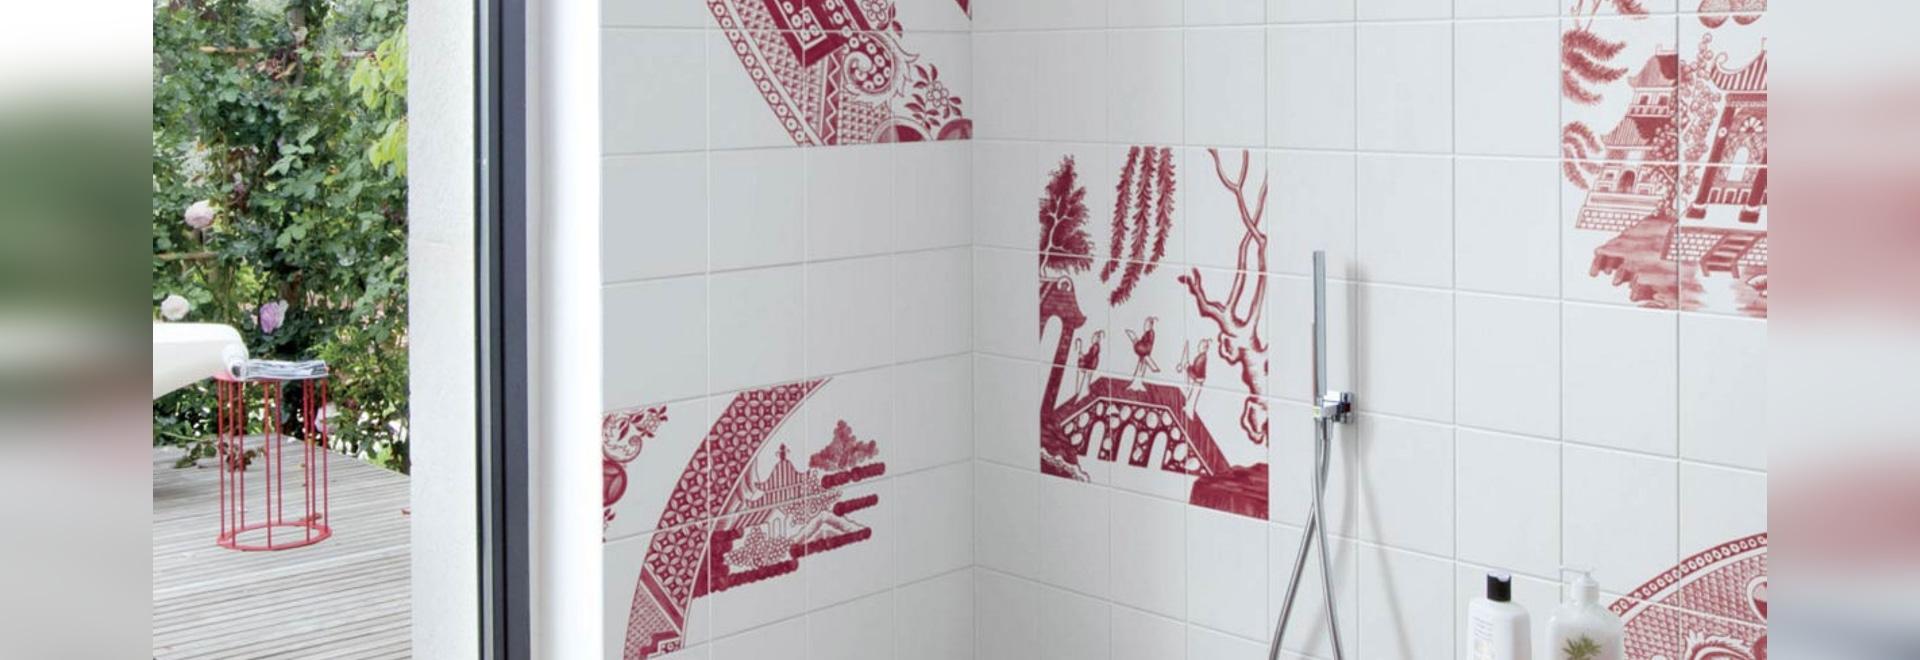 NEW: bathroom tile by Ceramica Bardelli - Ceramica Bardelli